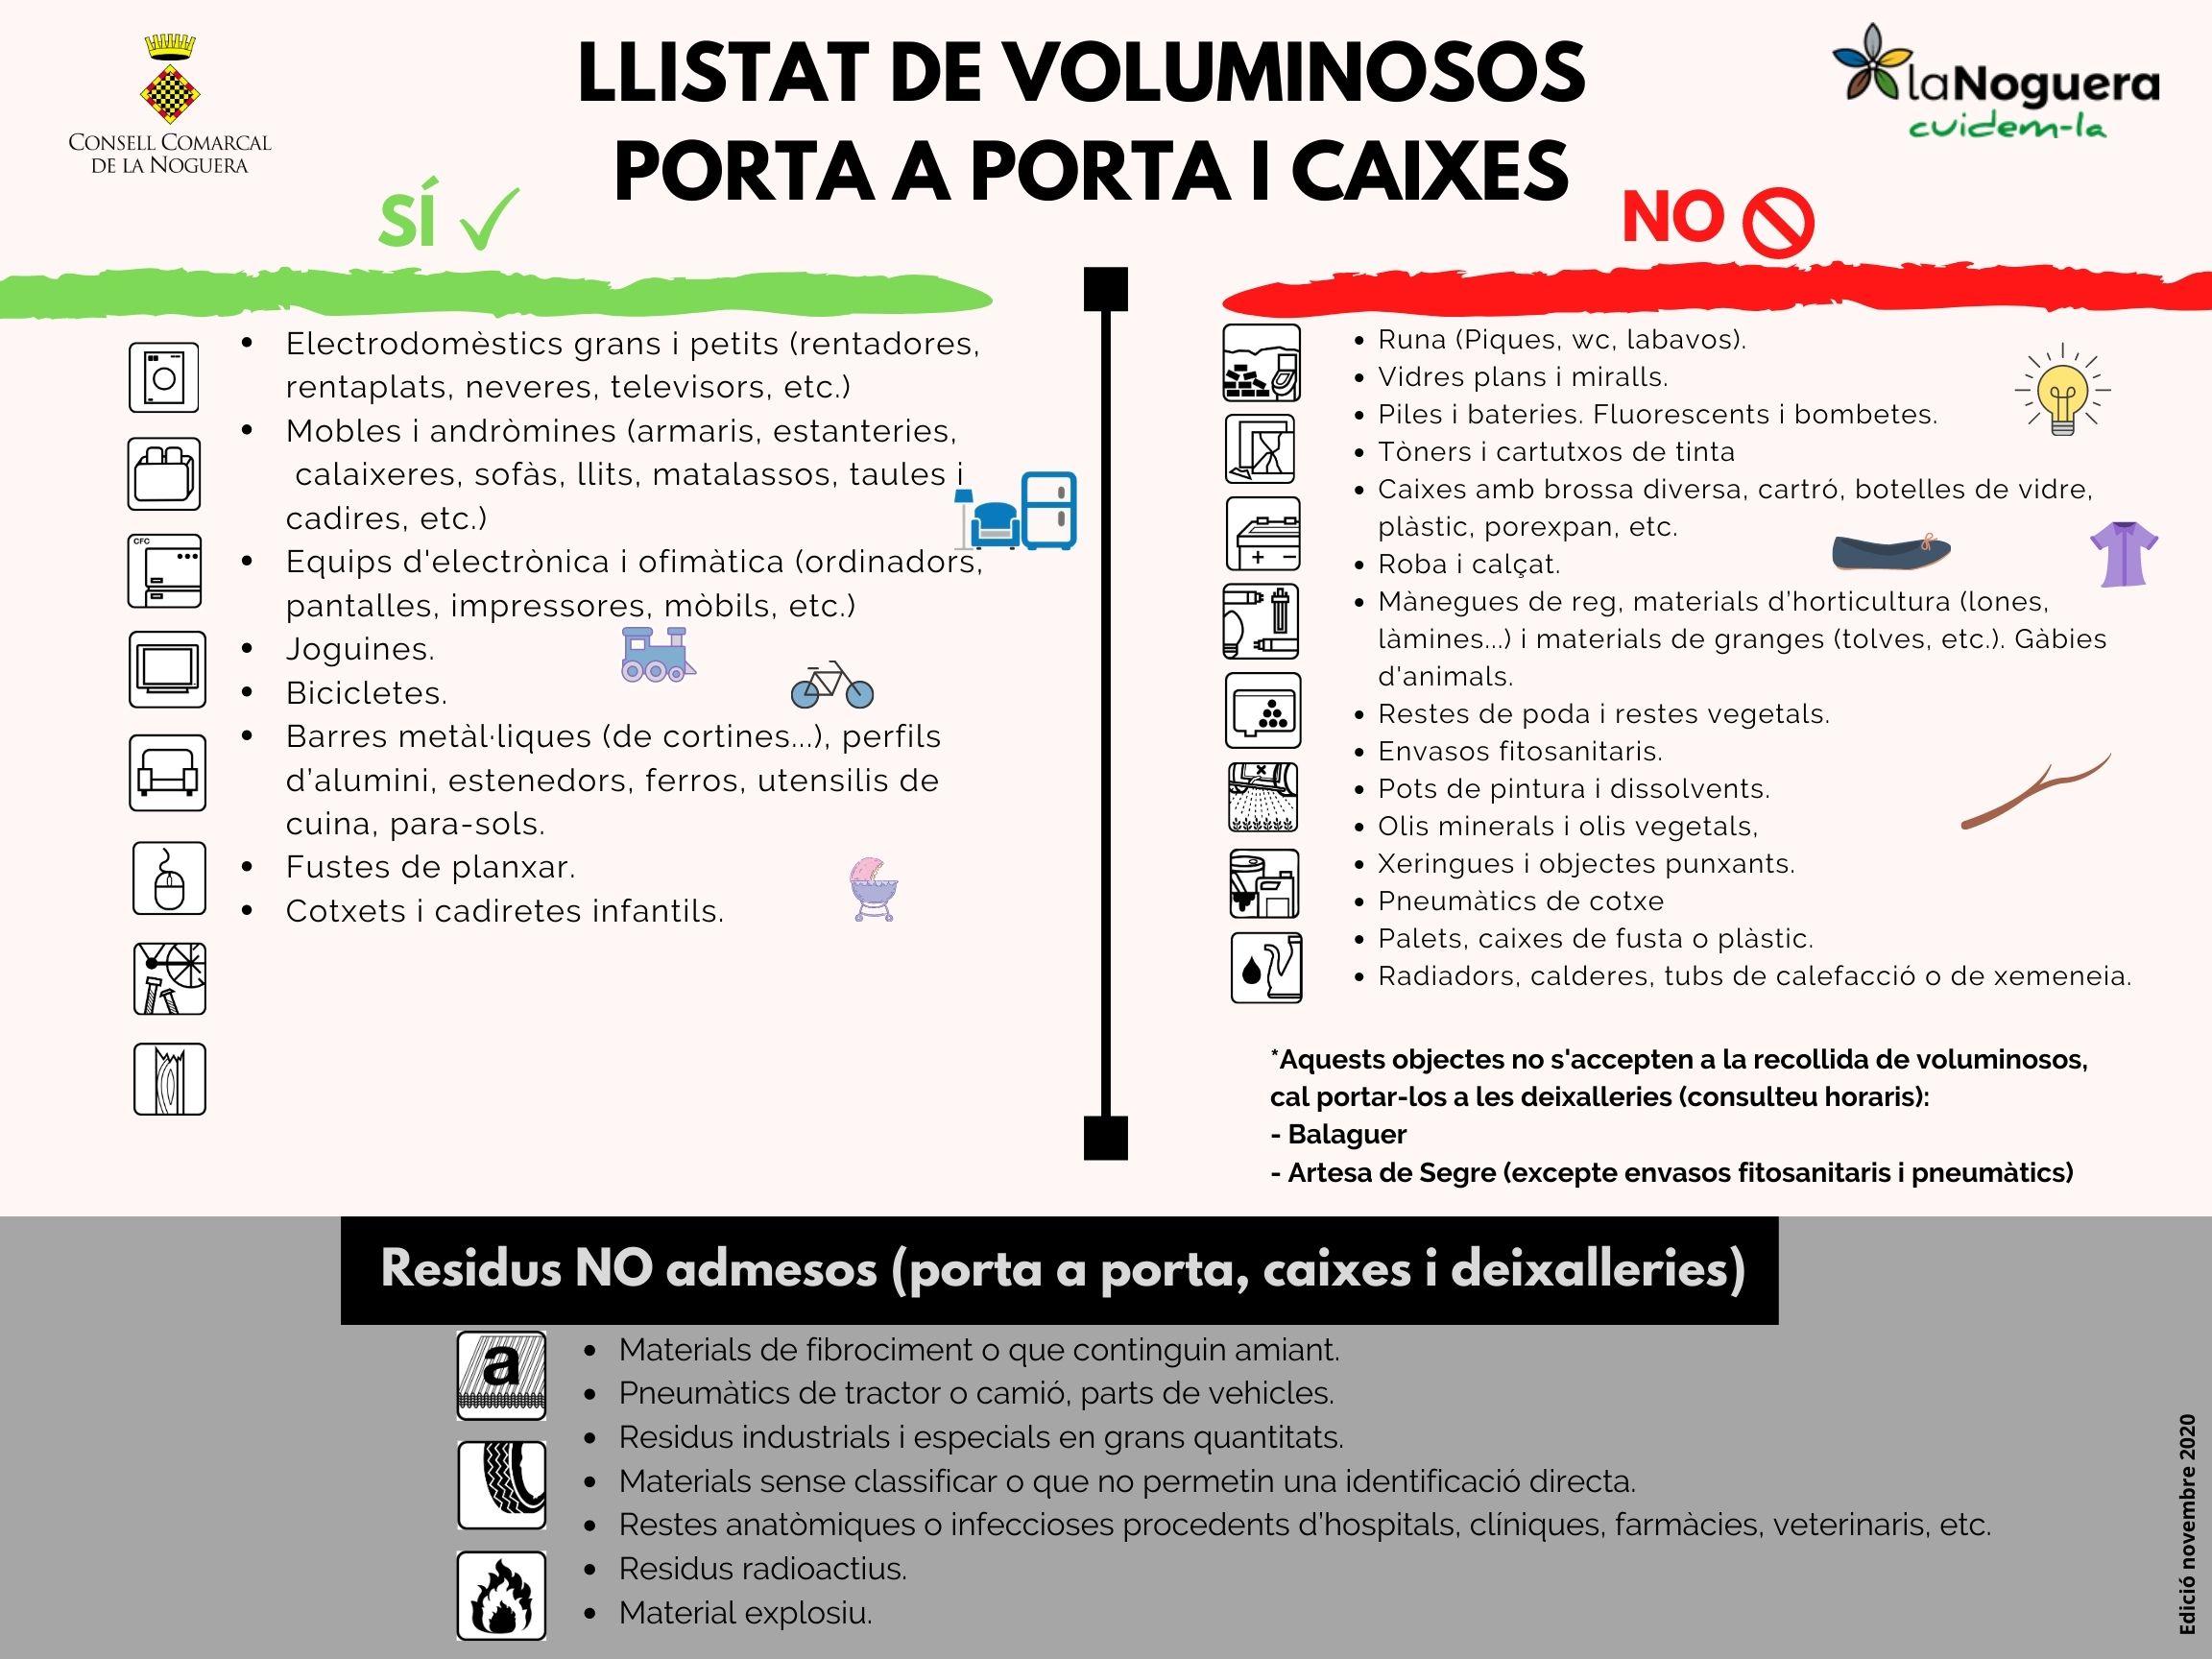 PENELLES Voluminosos admesos 2021.jpg